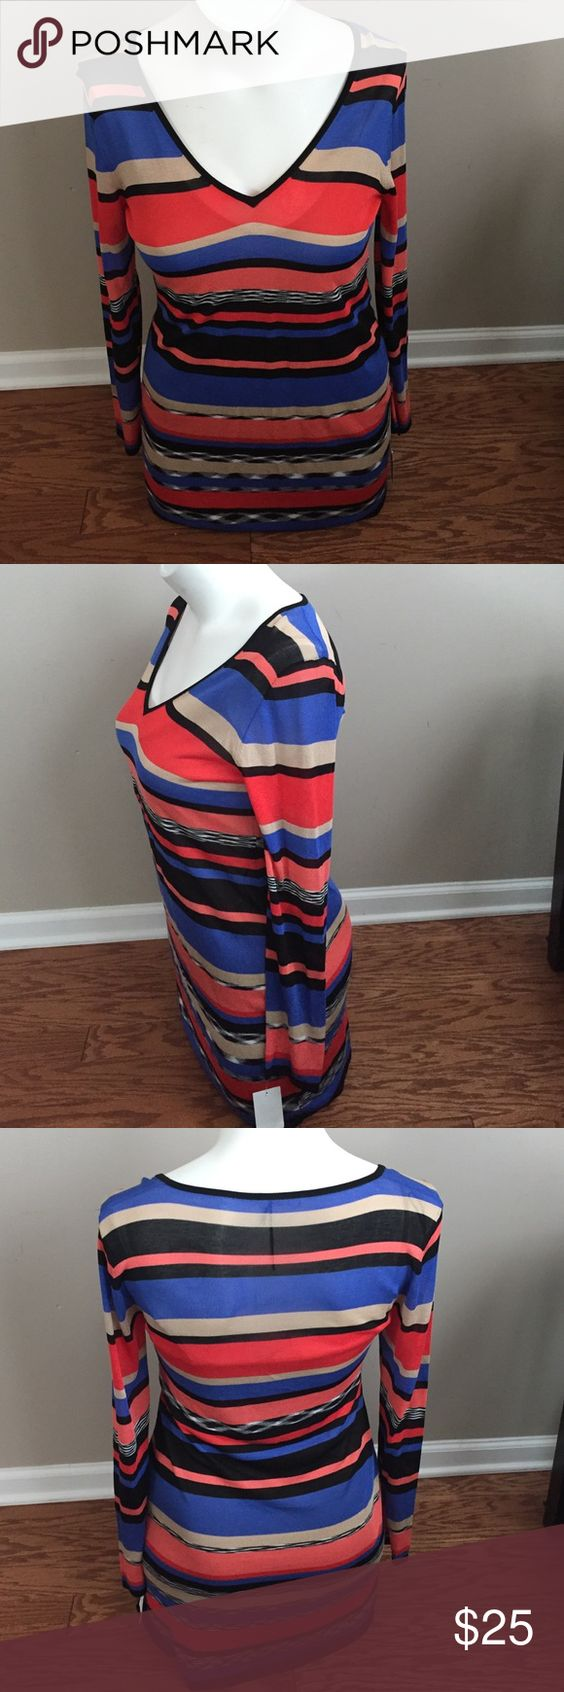 Trina Turk stripped knitted dress with slip Trina Turk stripped fine gauge knitted dress (gold, blk, coral and sapphire) with slip Trina Turk Dresses Mini